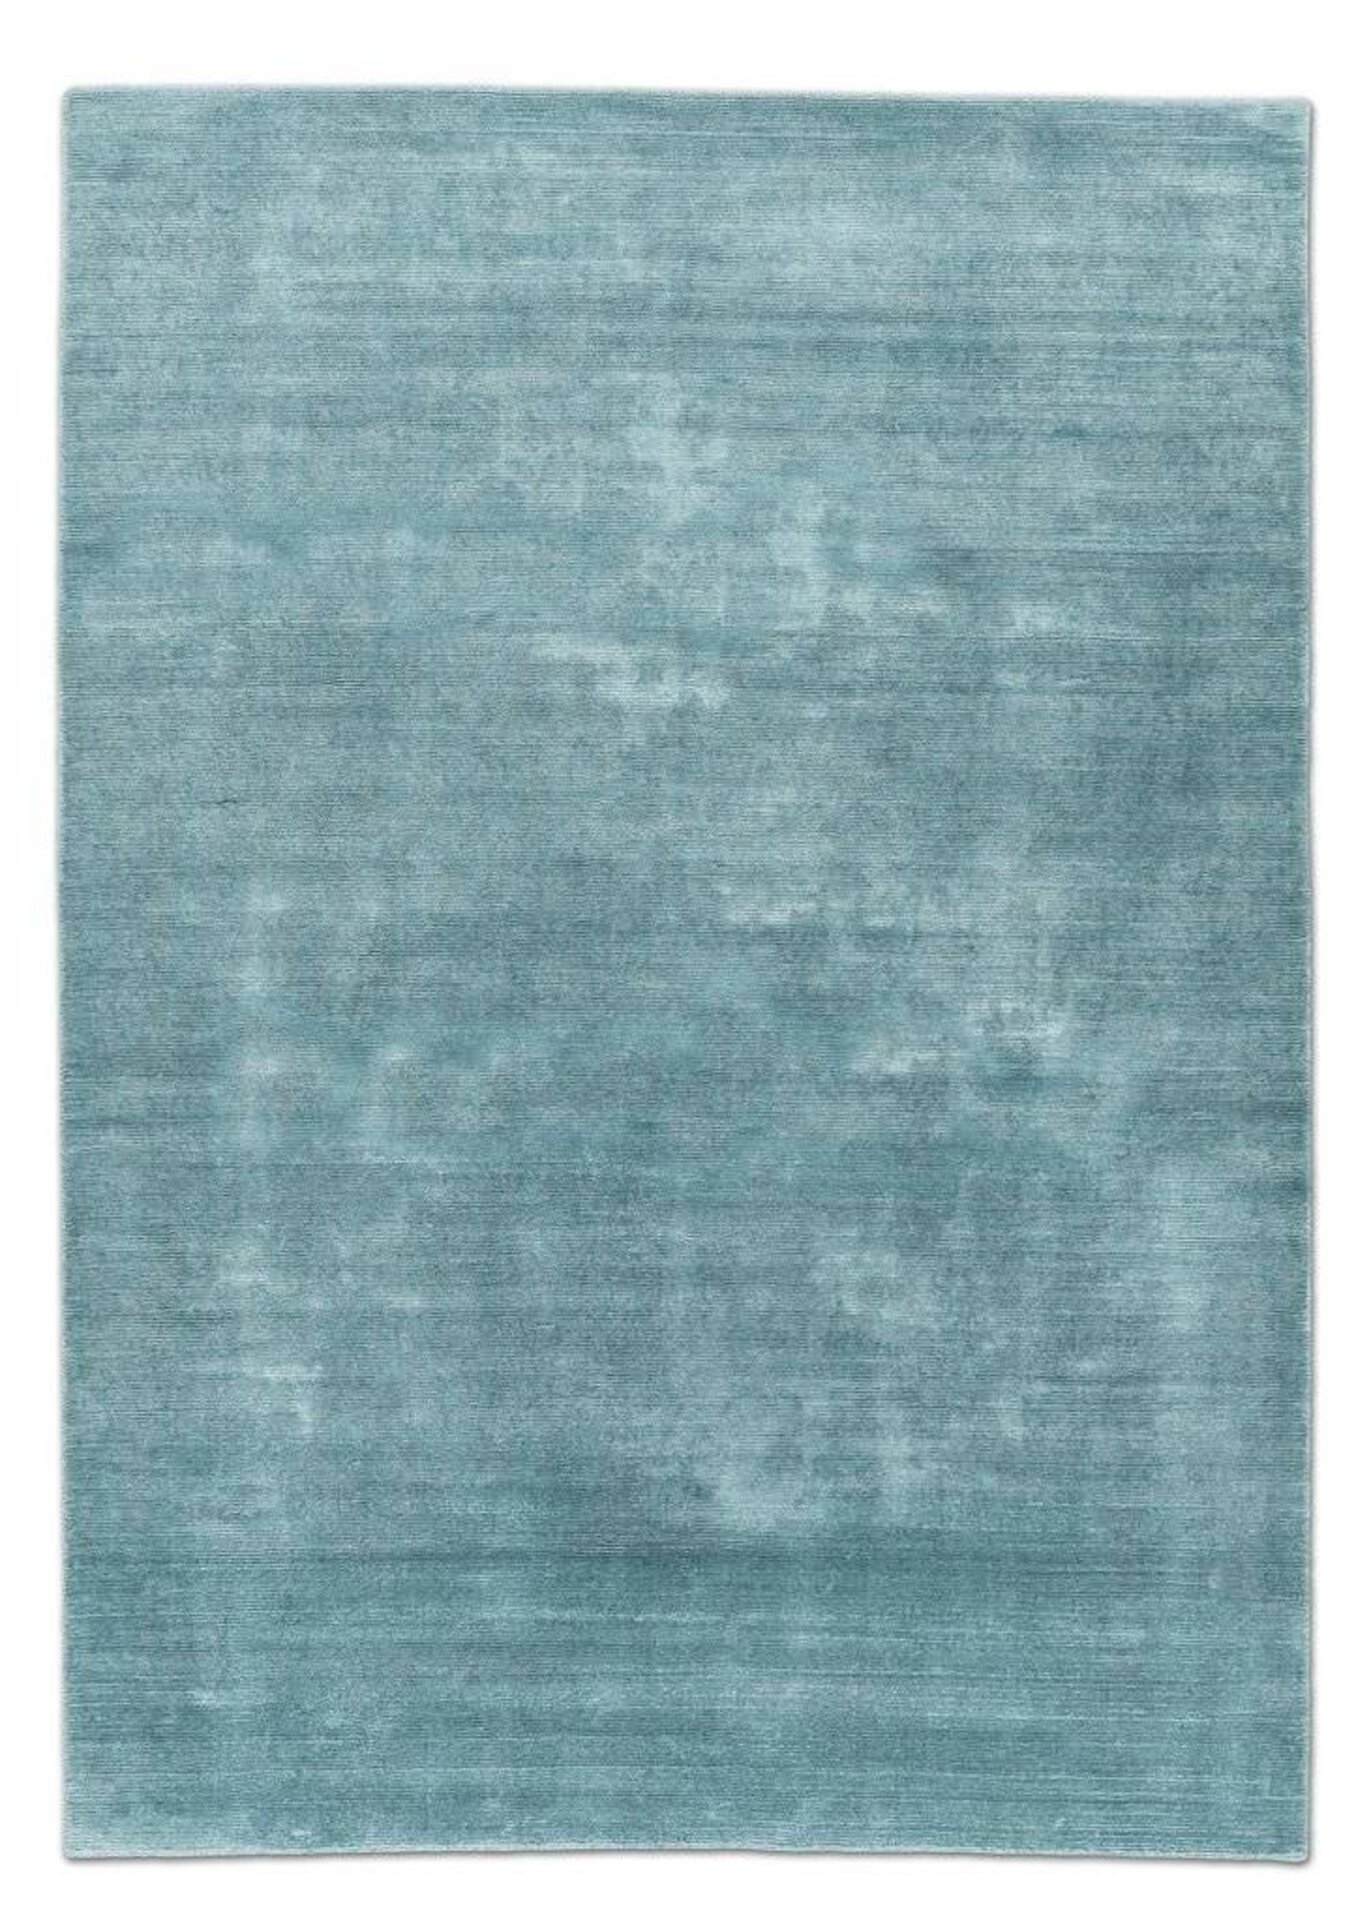 Maschinenwebteppich Soft Joop! Textil Blau 1 x 2 cm